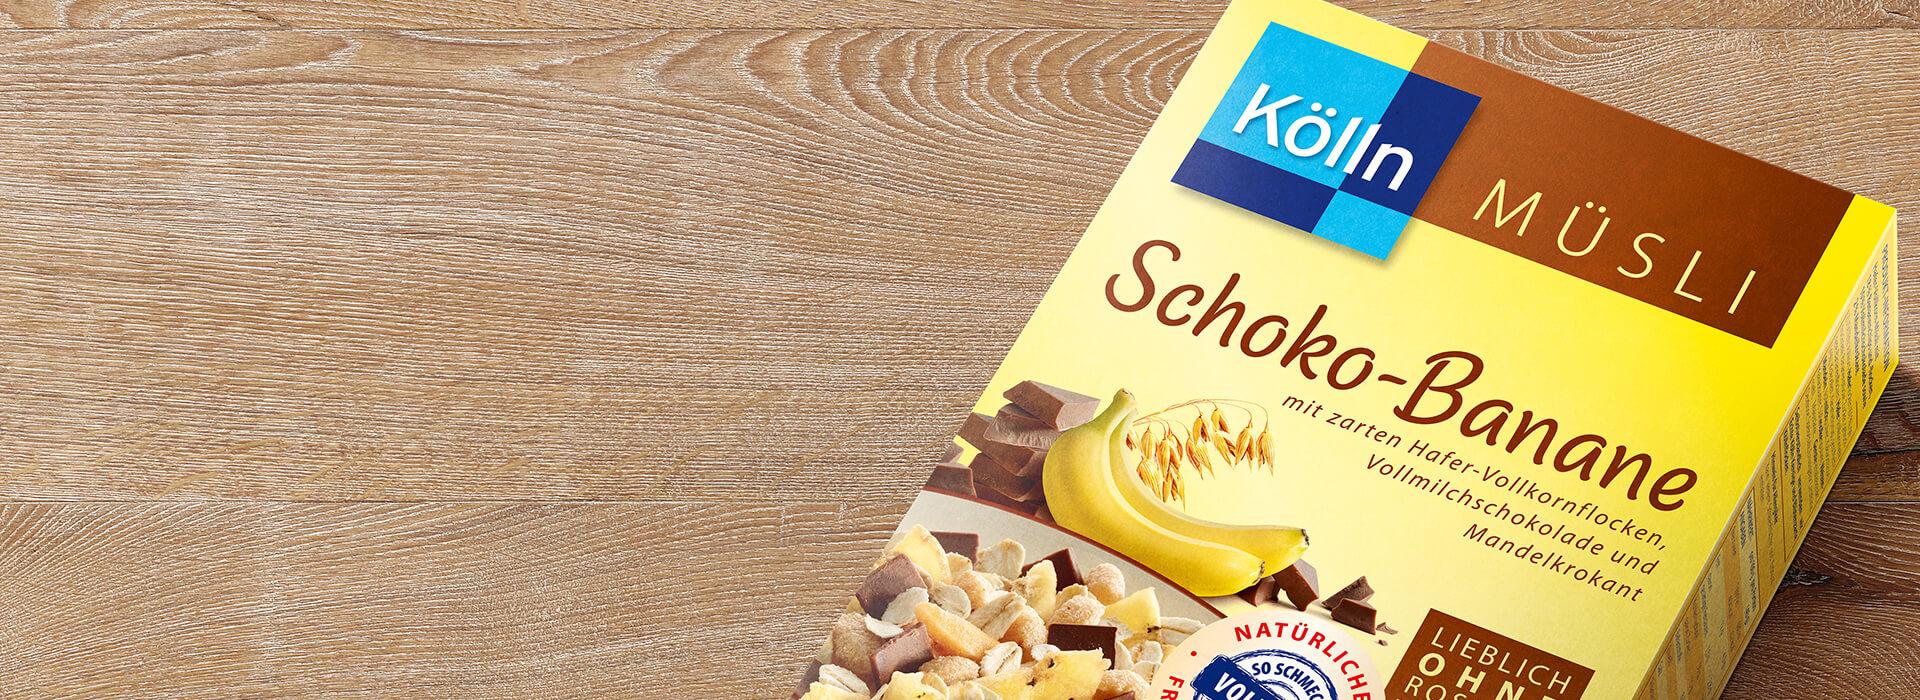 Schoko-Banane Müsli